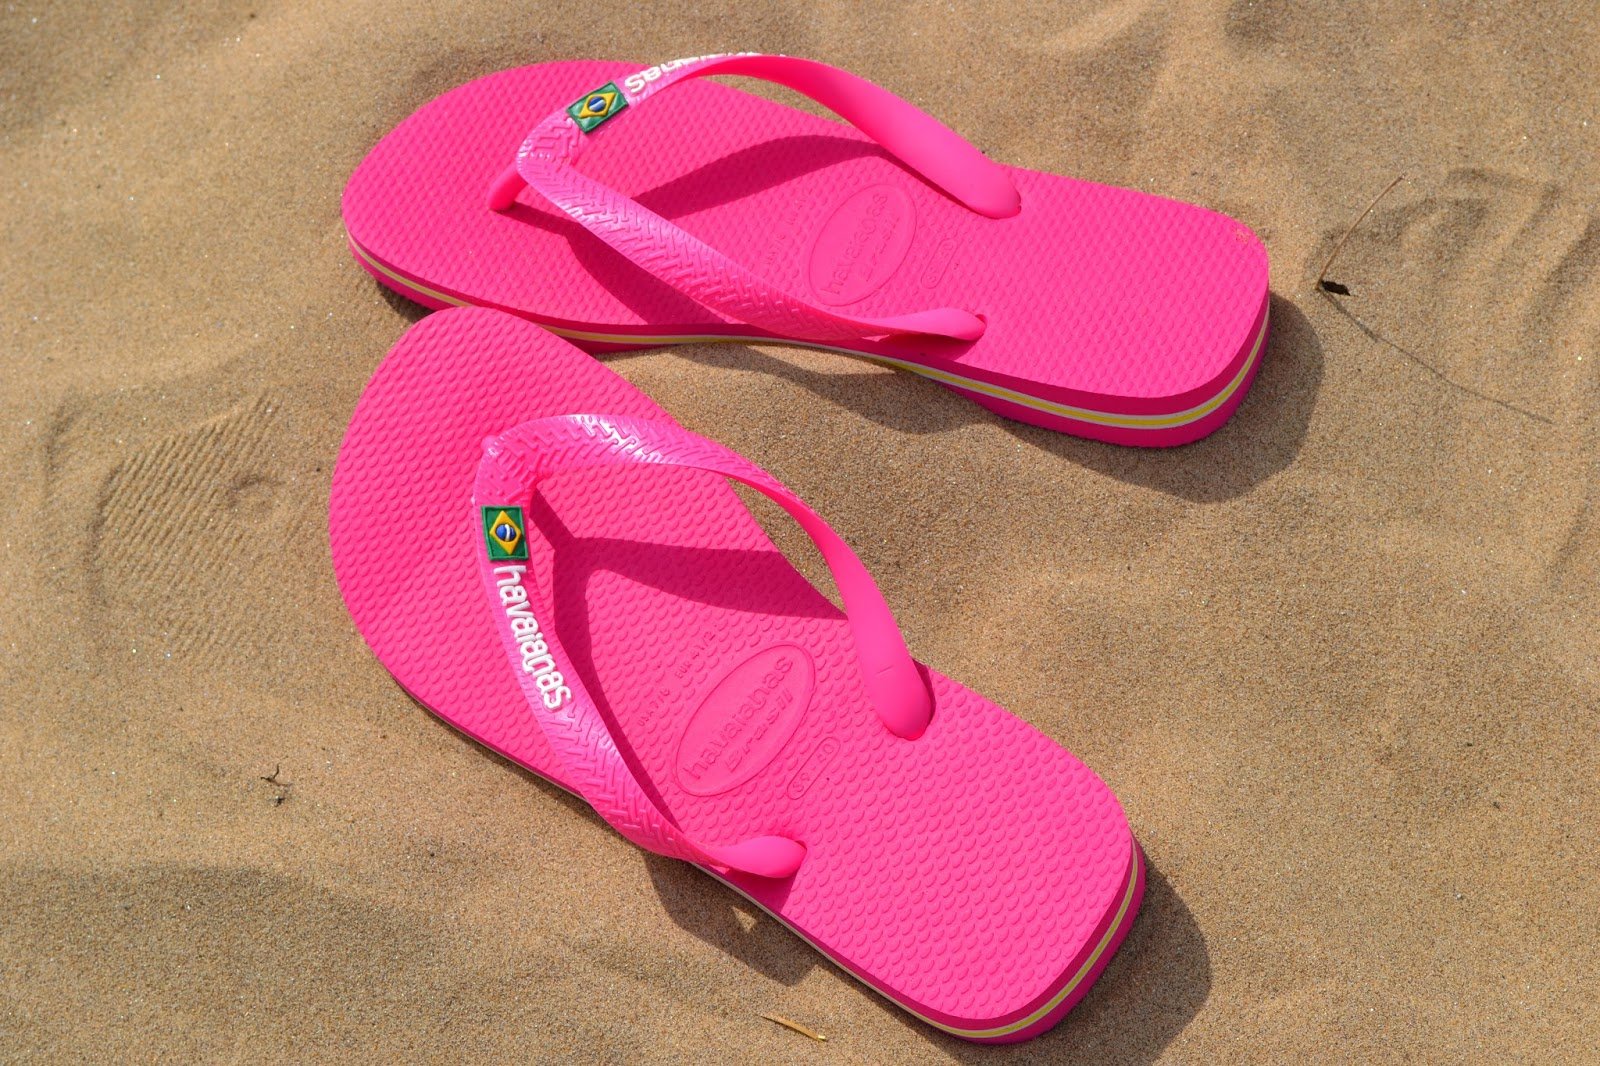 Havaianas at Flip Flop Shop - Rachel Nicole UK Blogger